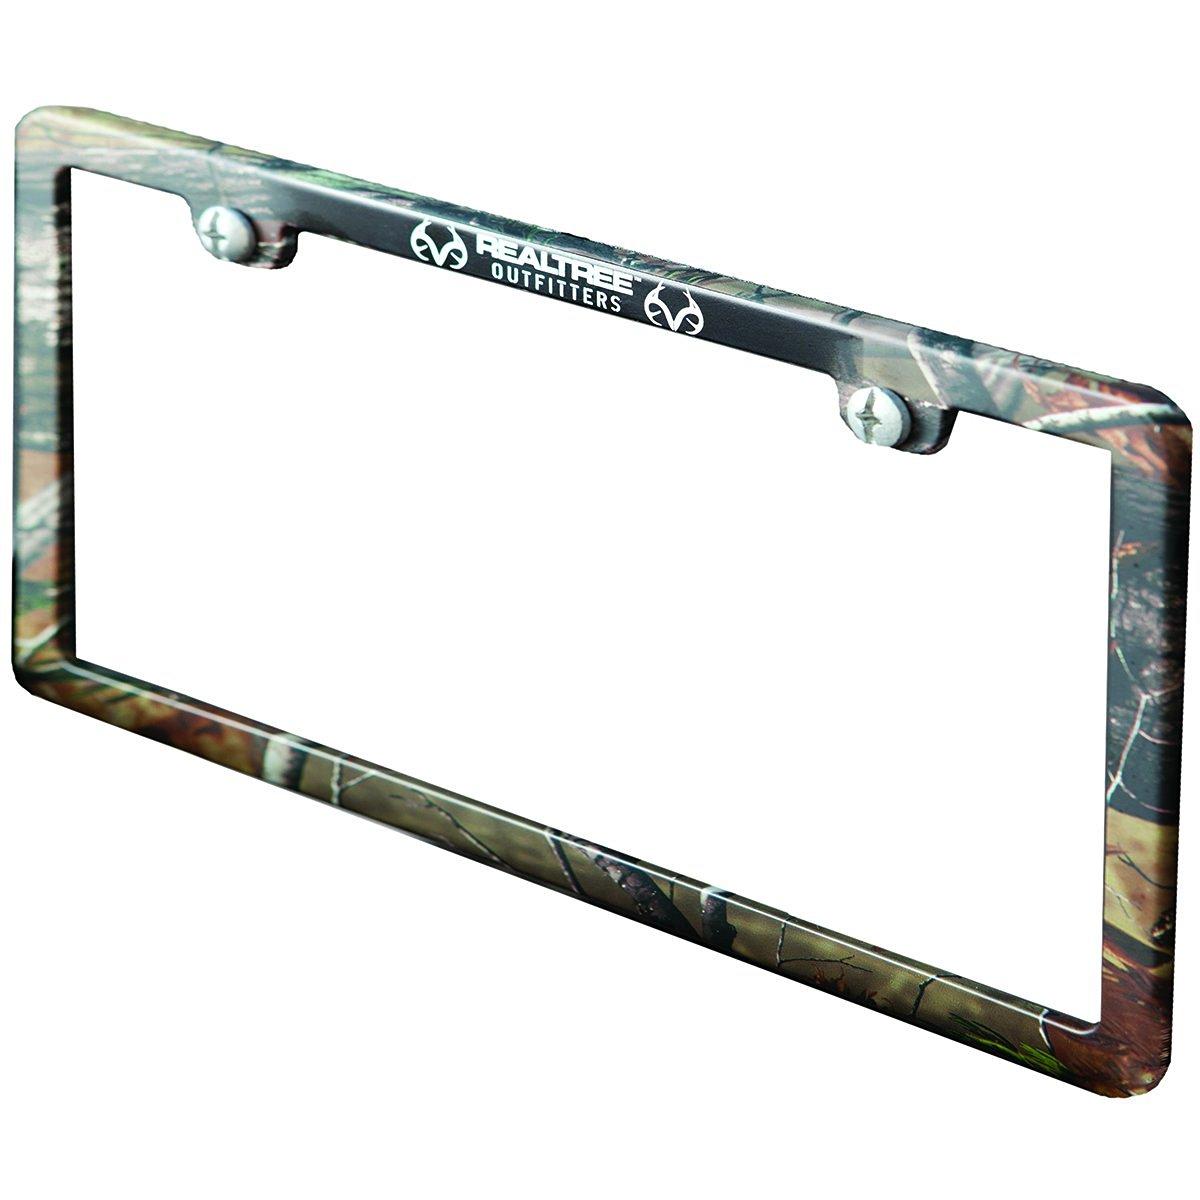 Realtree Camo License Plate Frame | Framess.co